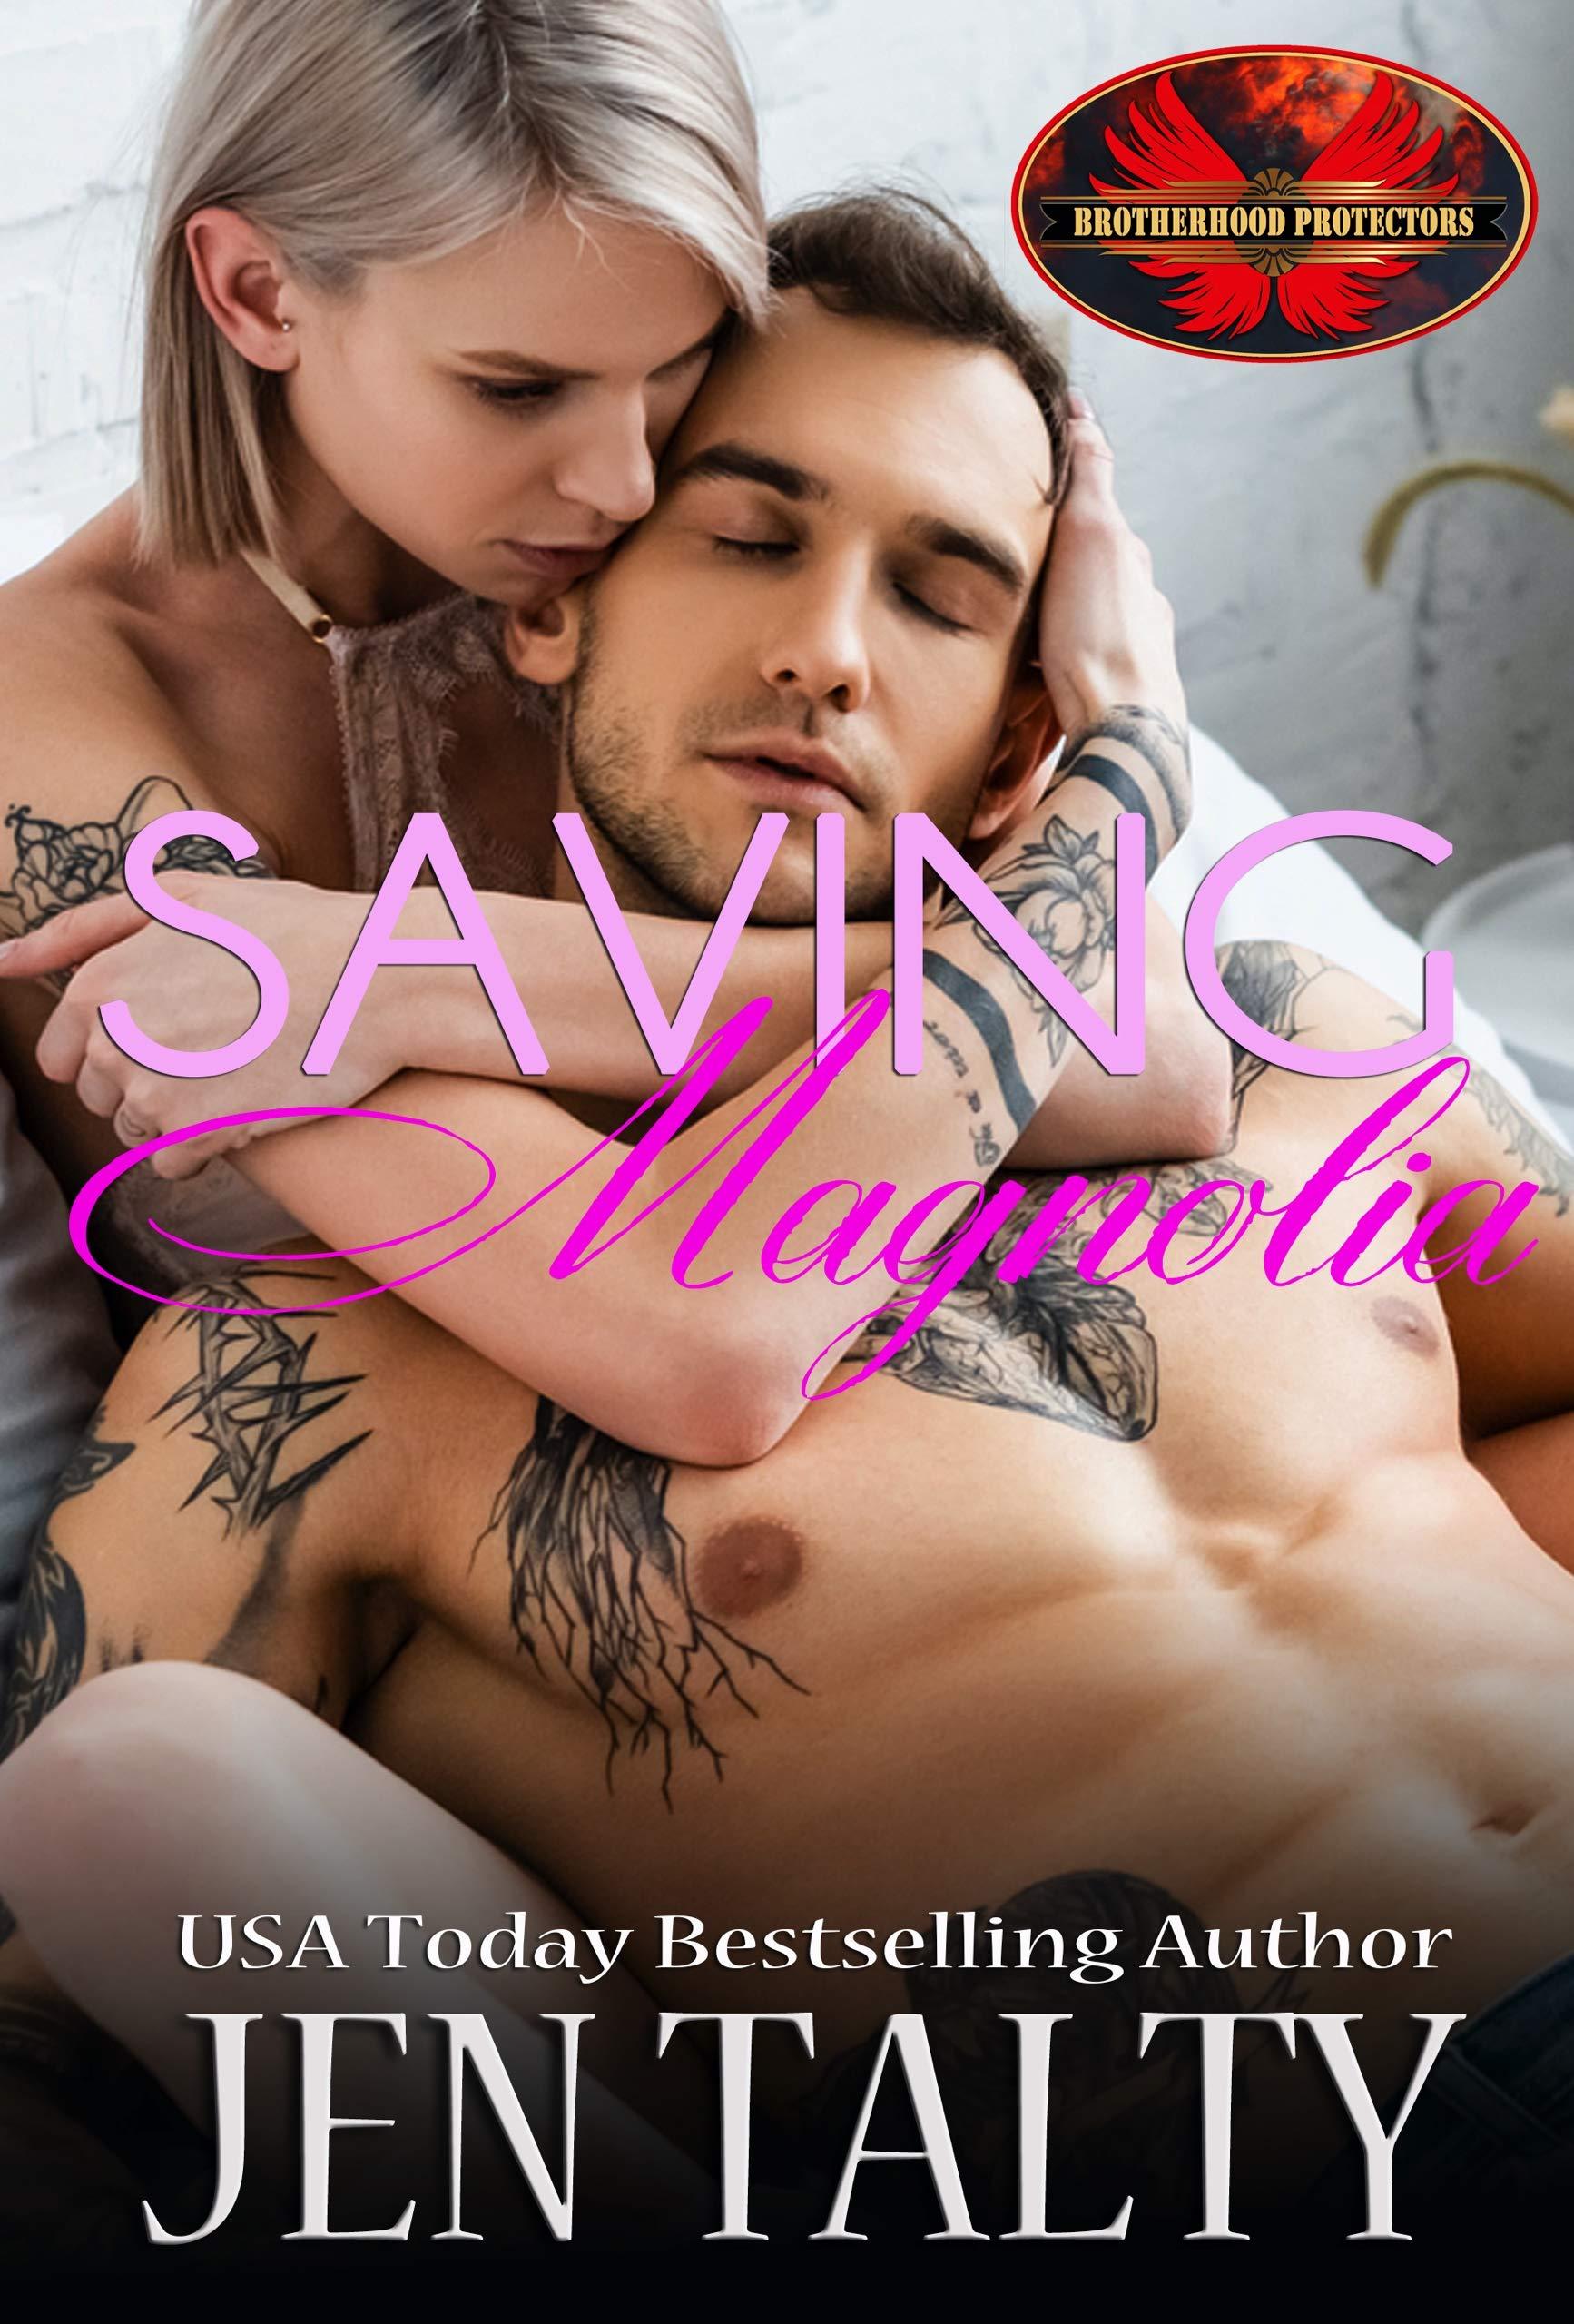 Jen Talty - Brotherhood Protectors World, Saving 2 - Saving Magnolia